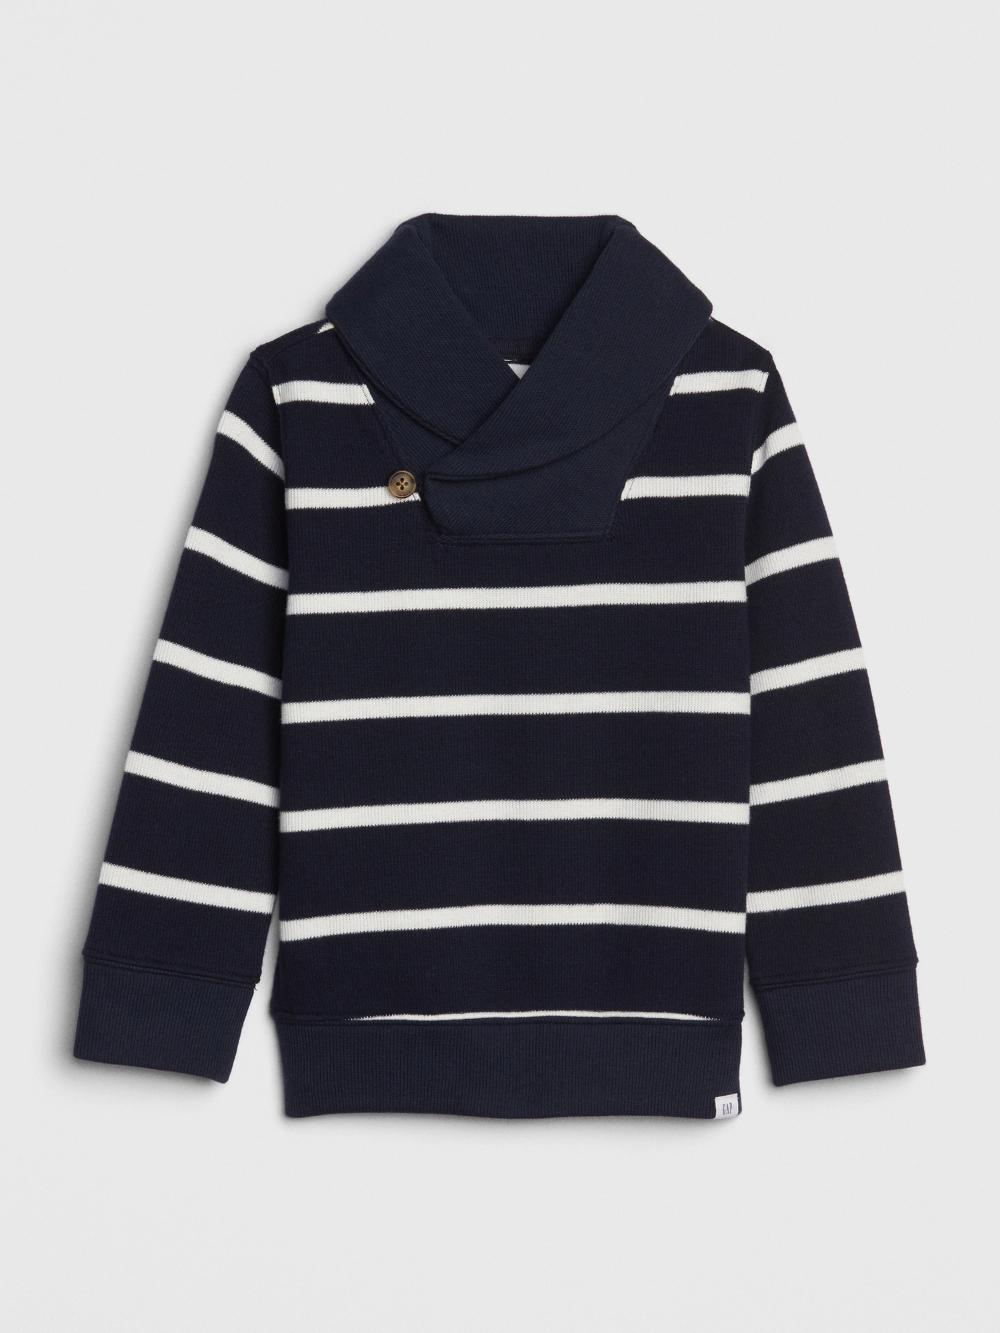 GAP Kid Sweatshirt Pullover Long Sleeve Collar Neck